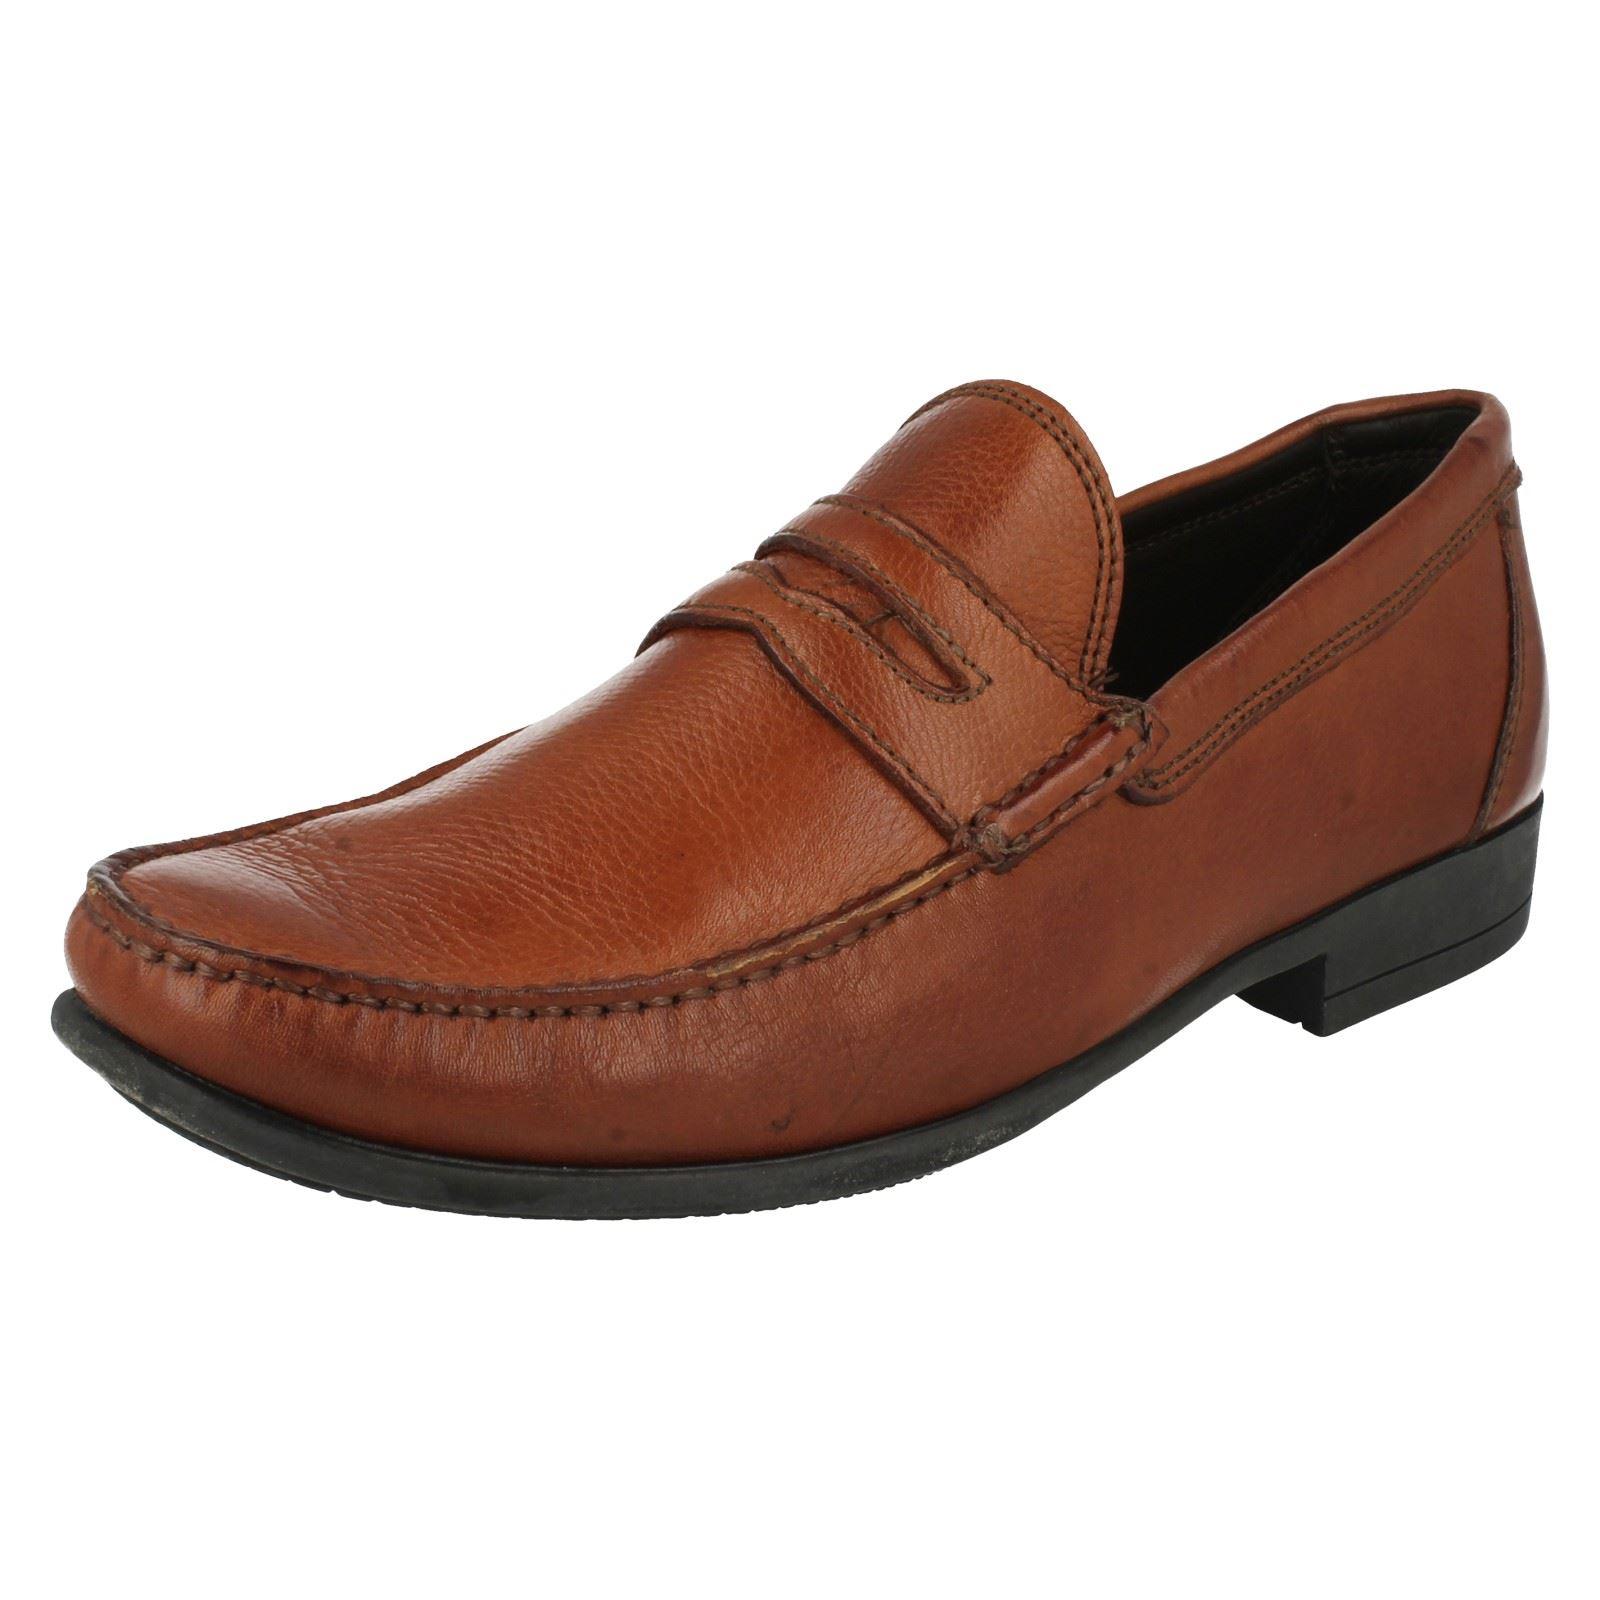 "Homme Anatomic Smart Mocassin Chaussures /""Petropolis/'s"